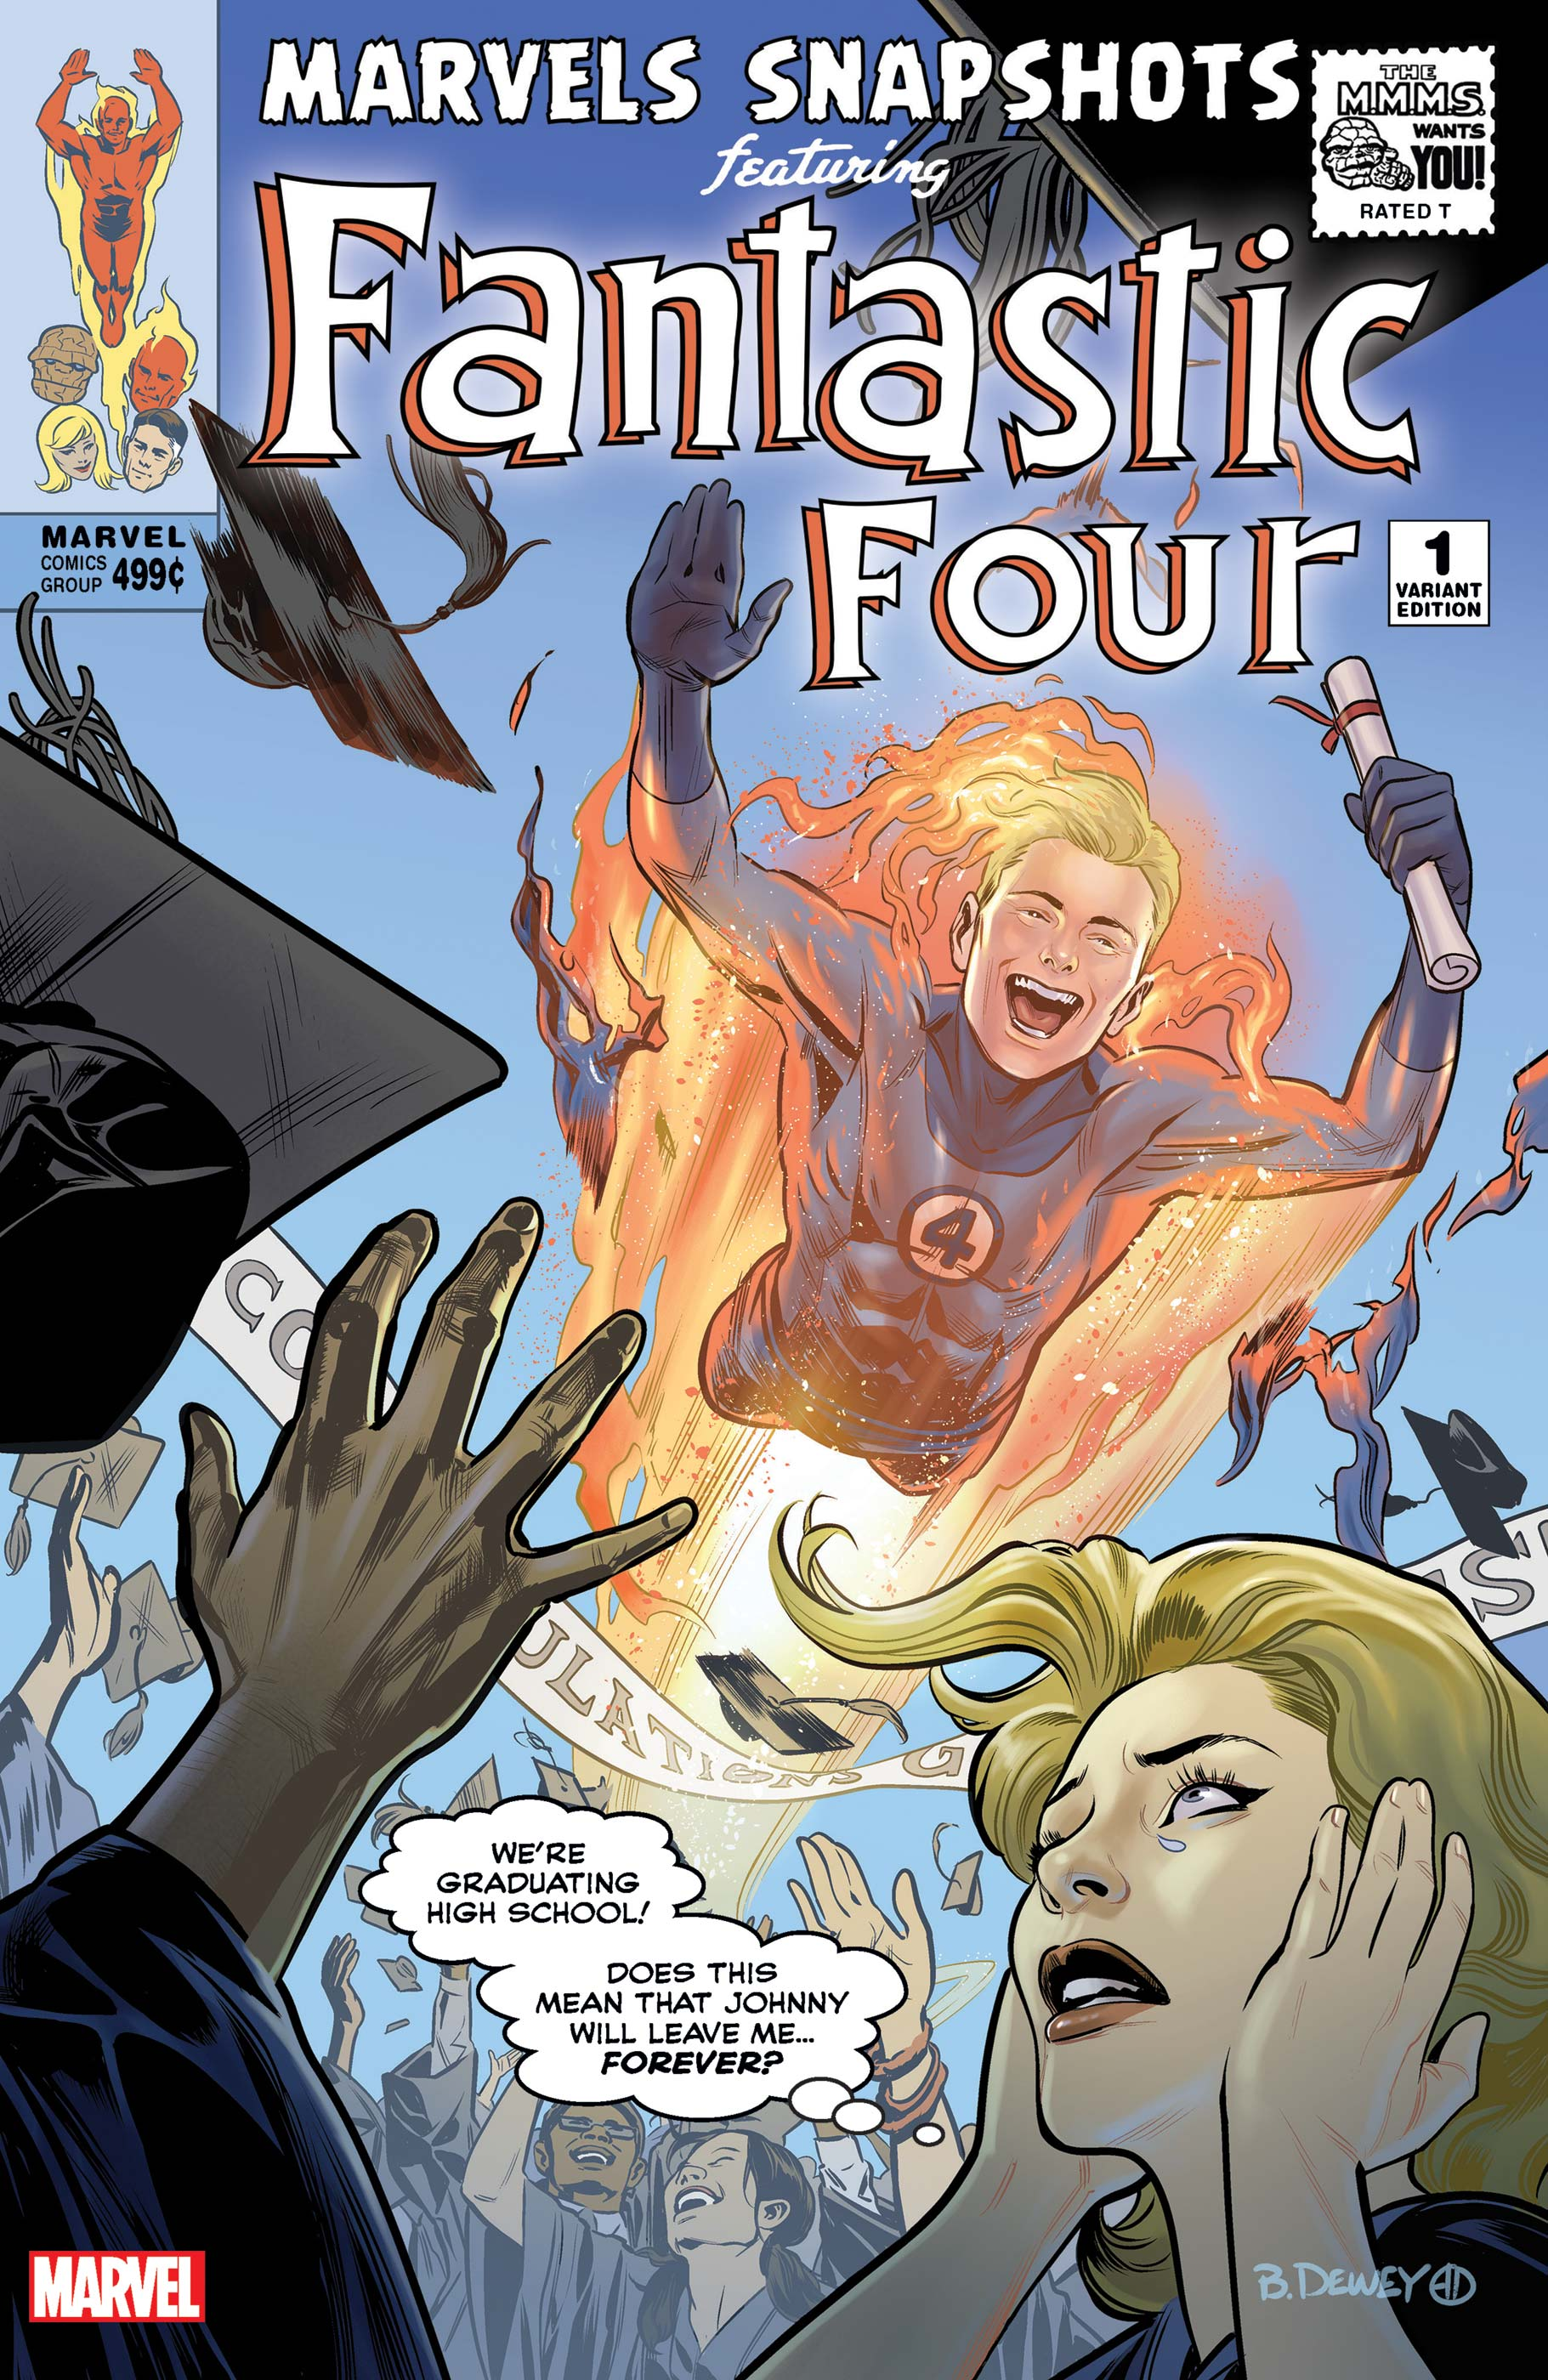 Fantastic Four: Marvels Snapshots (2020) #1 (Variant)